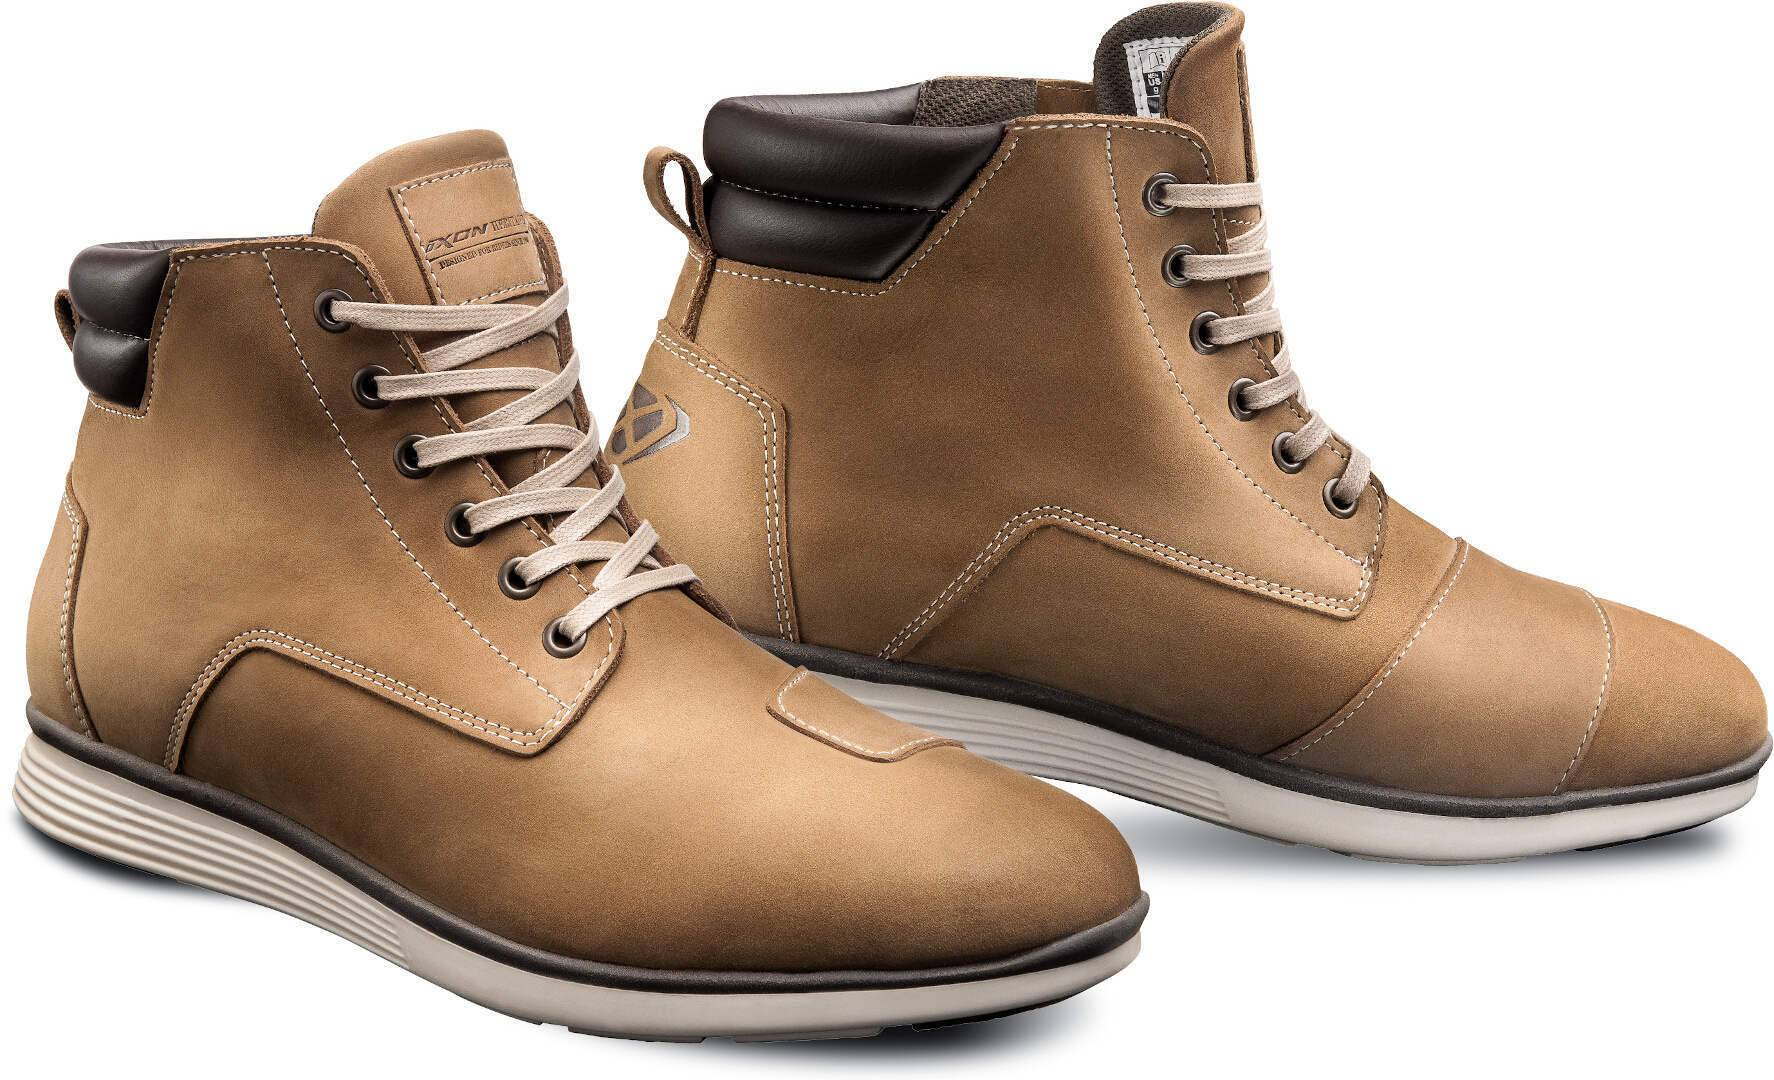 Ixon Akron Chaussures de moto Brun taille : 45